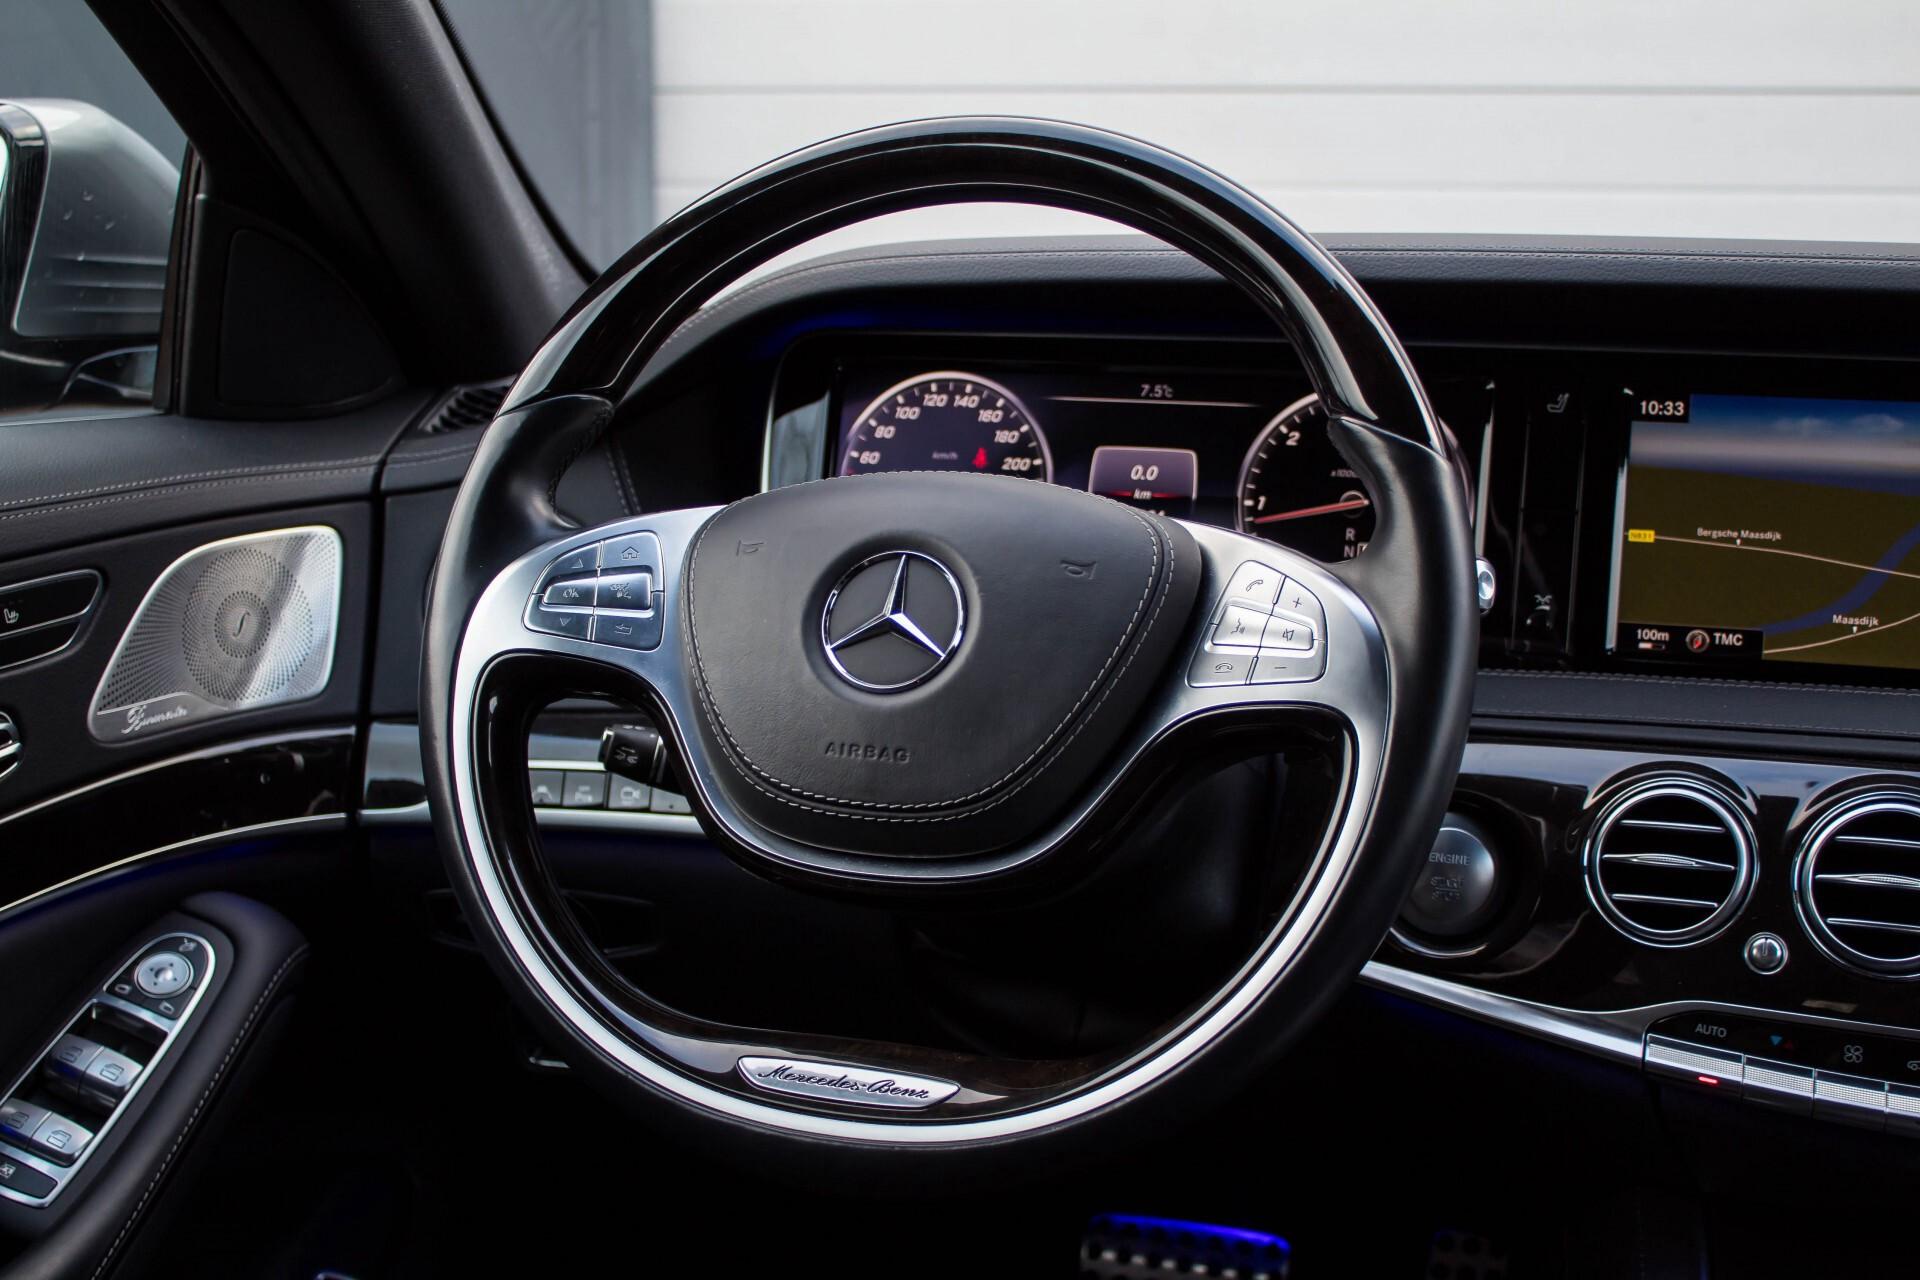 Mercedes-Benz S-Klasse 350 BlueTEC 63 AMG Panorama/Distronic/Keyless/Massage/Burmester Aut7 Foto 8